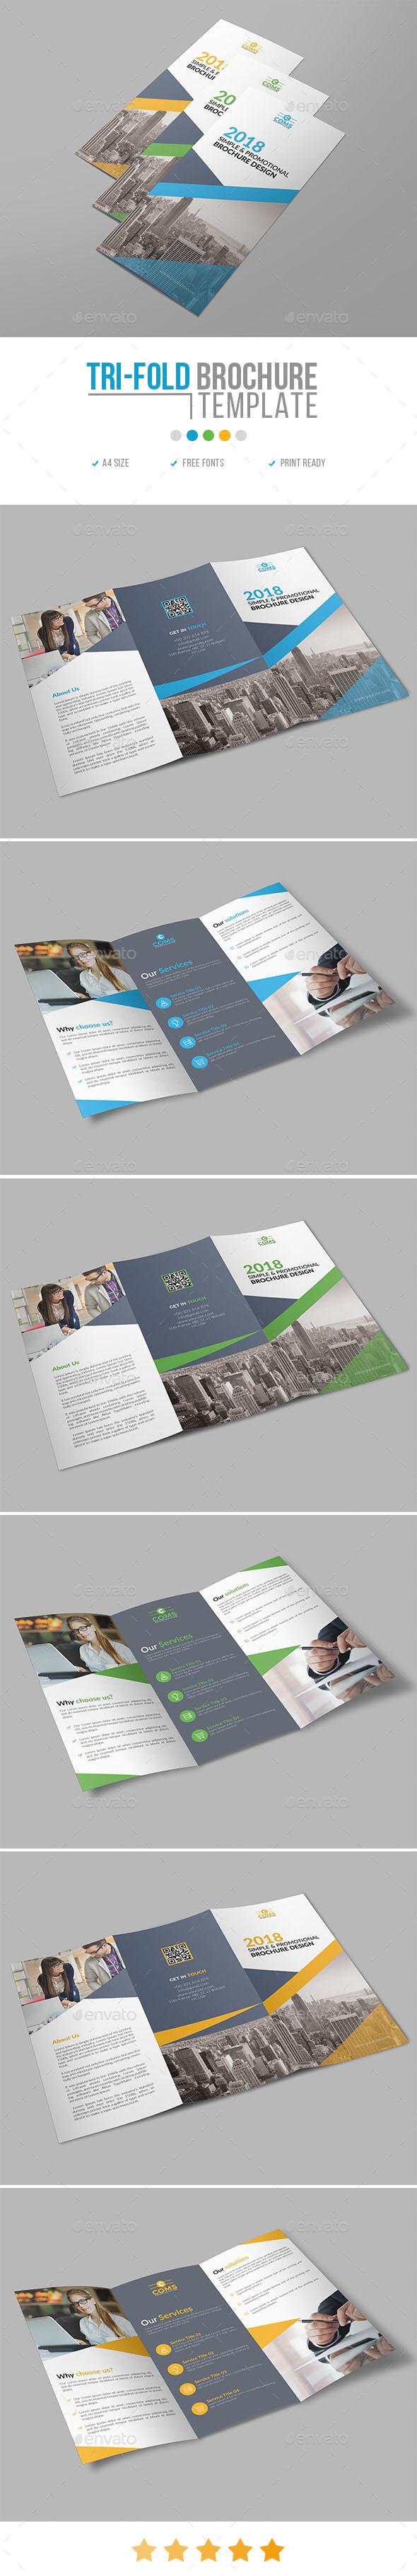 Corporate Trifold Brochure Template 20 - Corporate Brochures